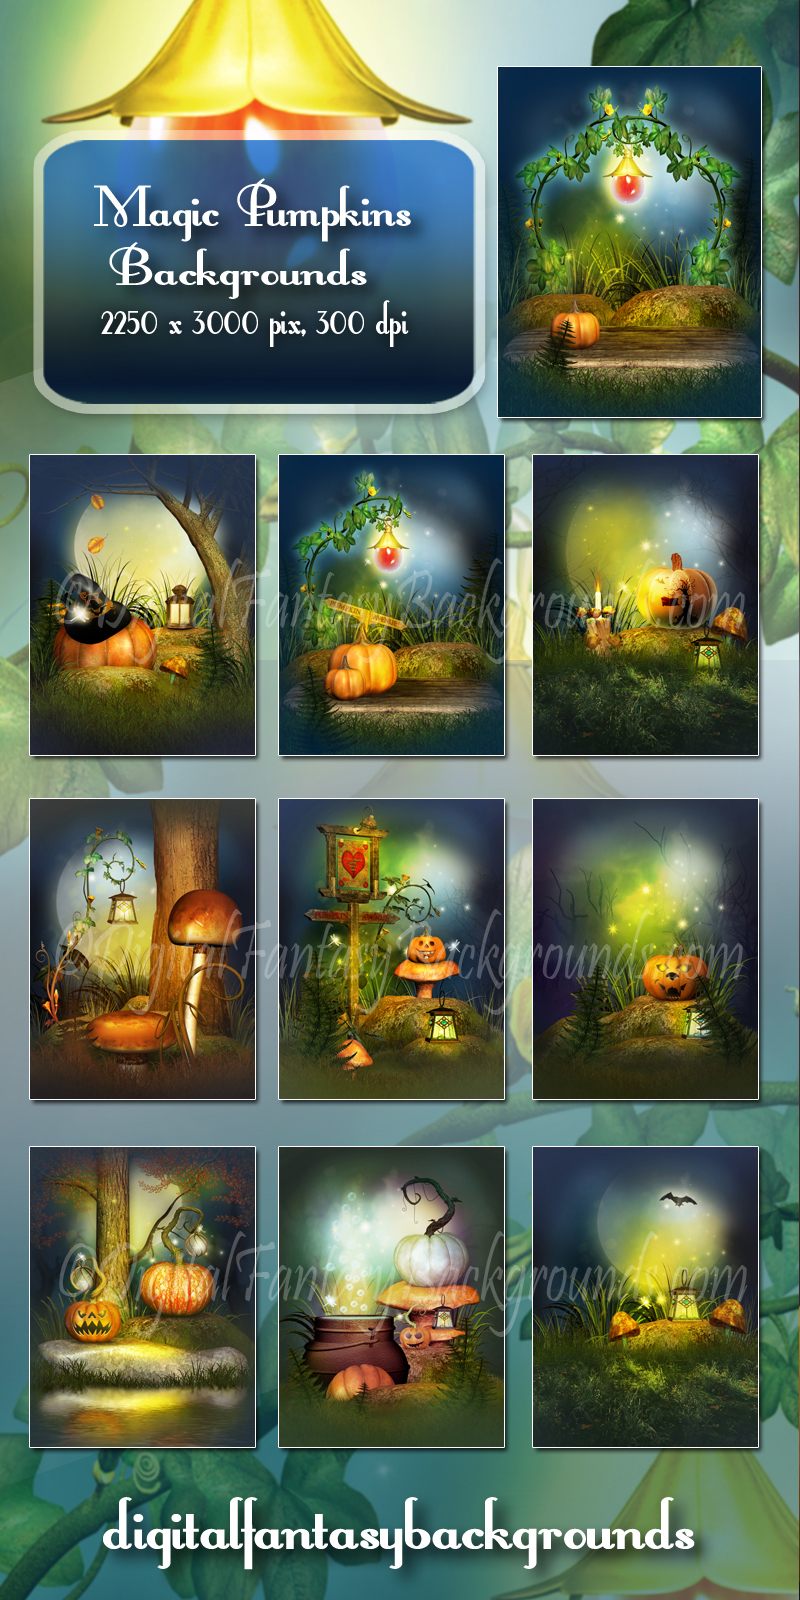 assnezana_Magic_Pumpkins1_big.jpg